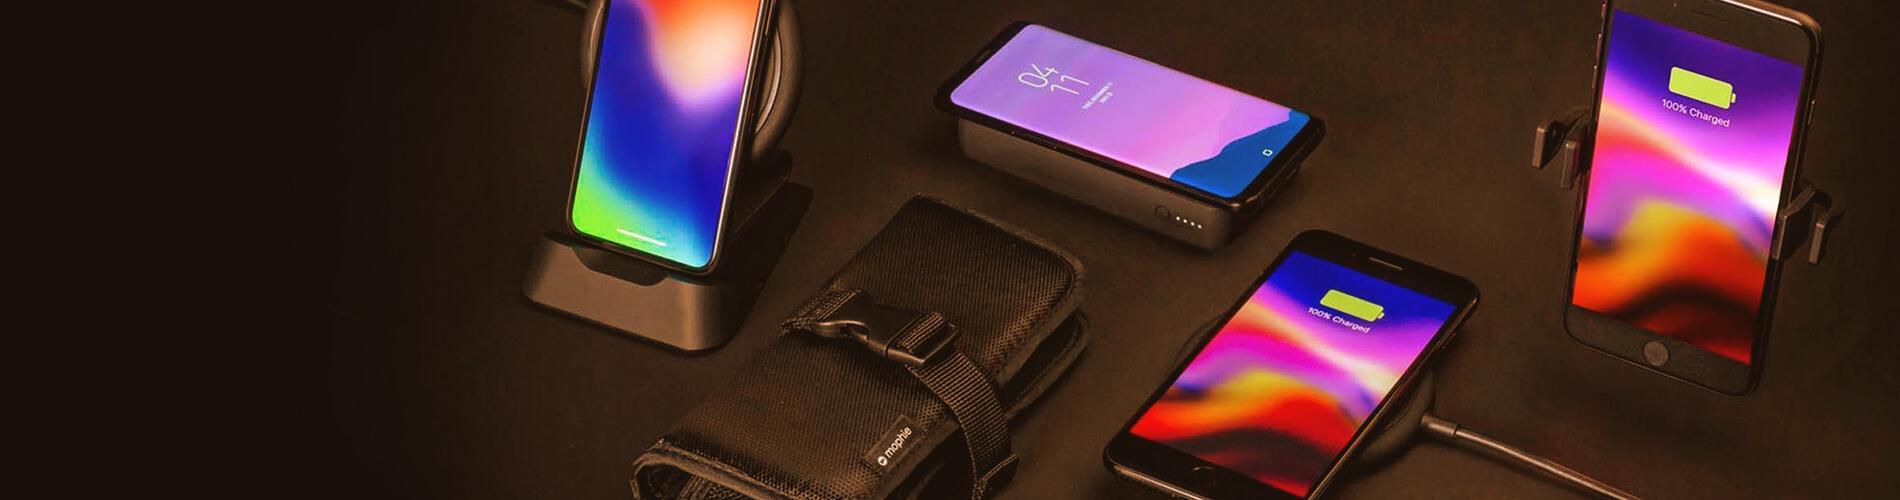 Portable Devices Brisbane Supplier